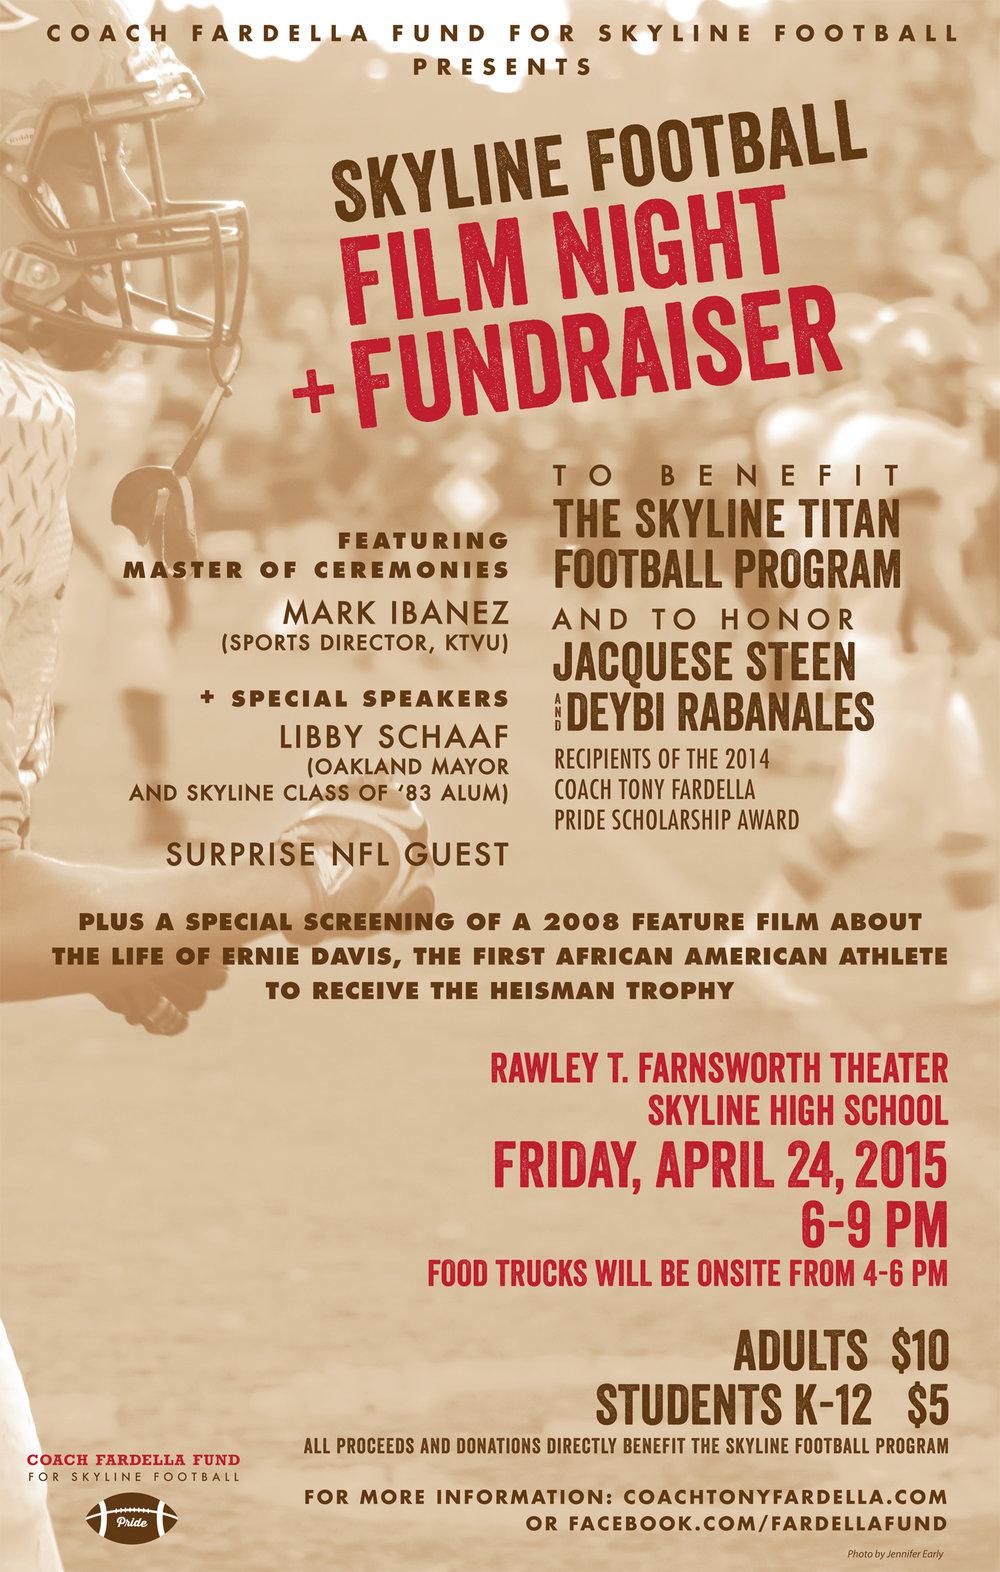 Skyline High School Football Program Fundraising Event Poster